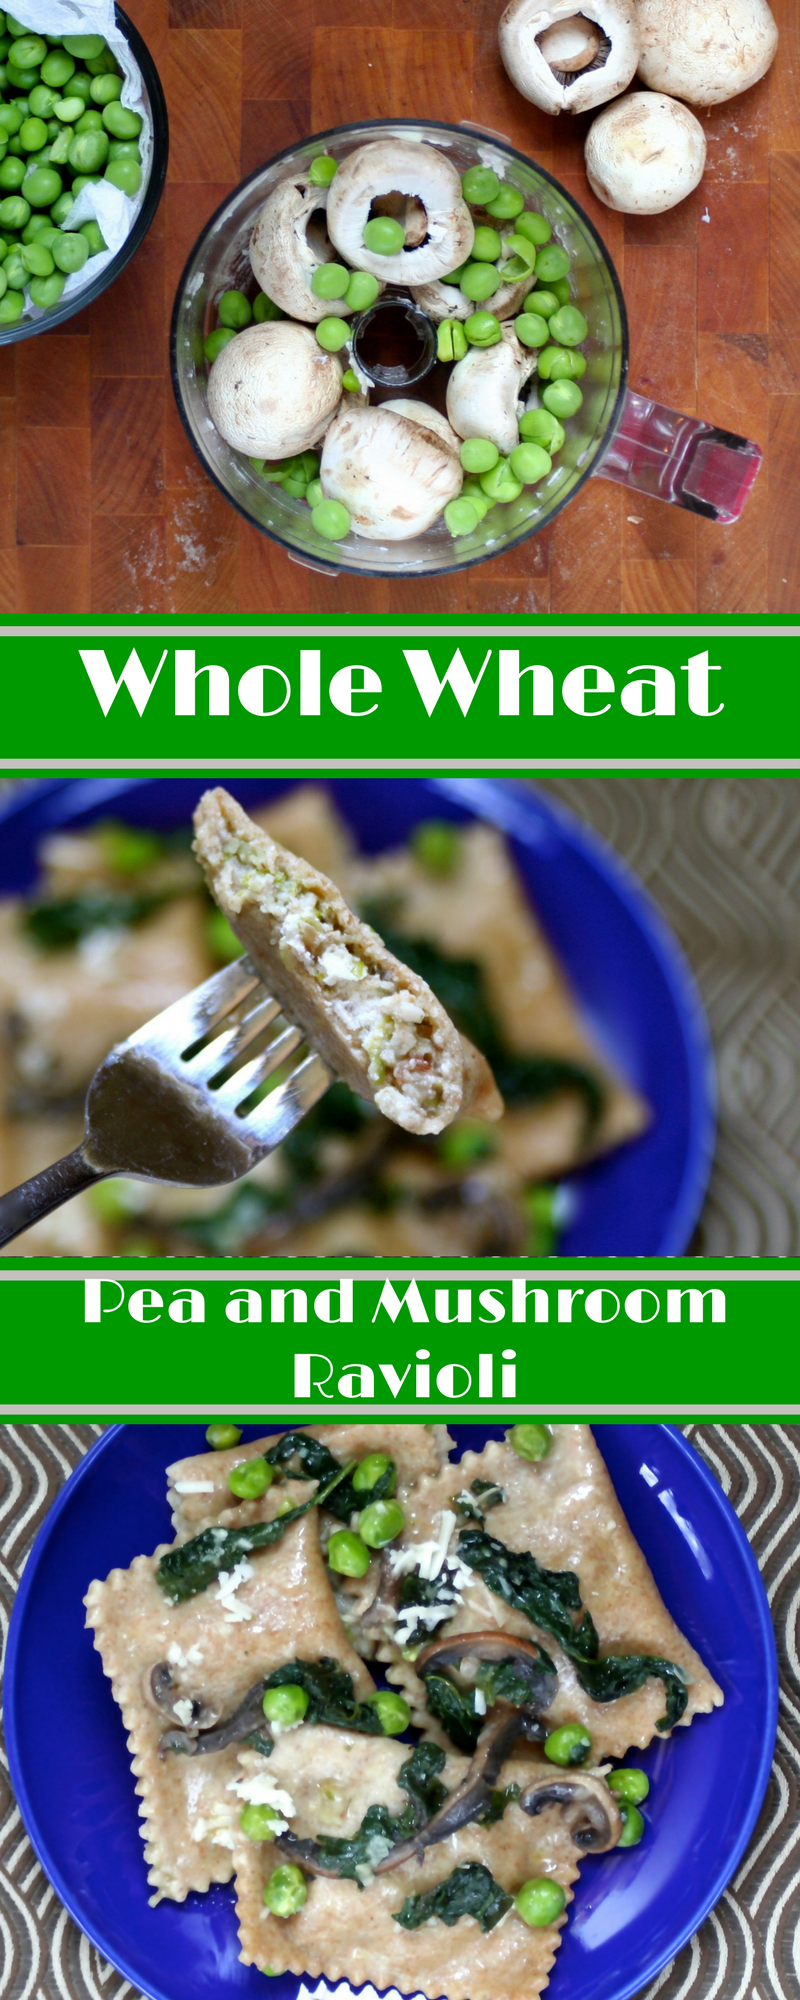 Whole Wheat Pea and Mushroom Ravioli.png